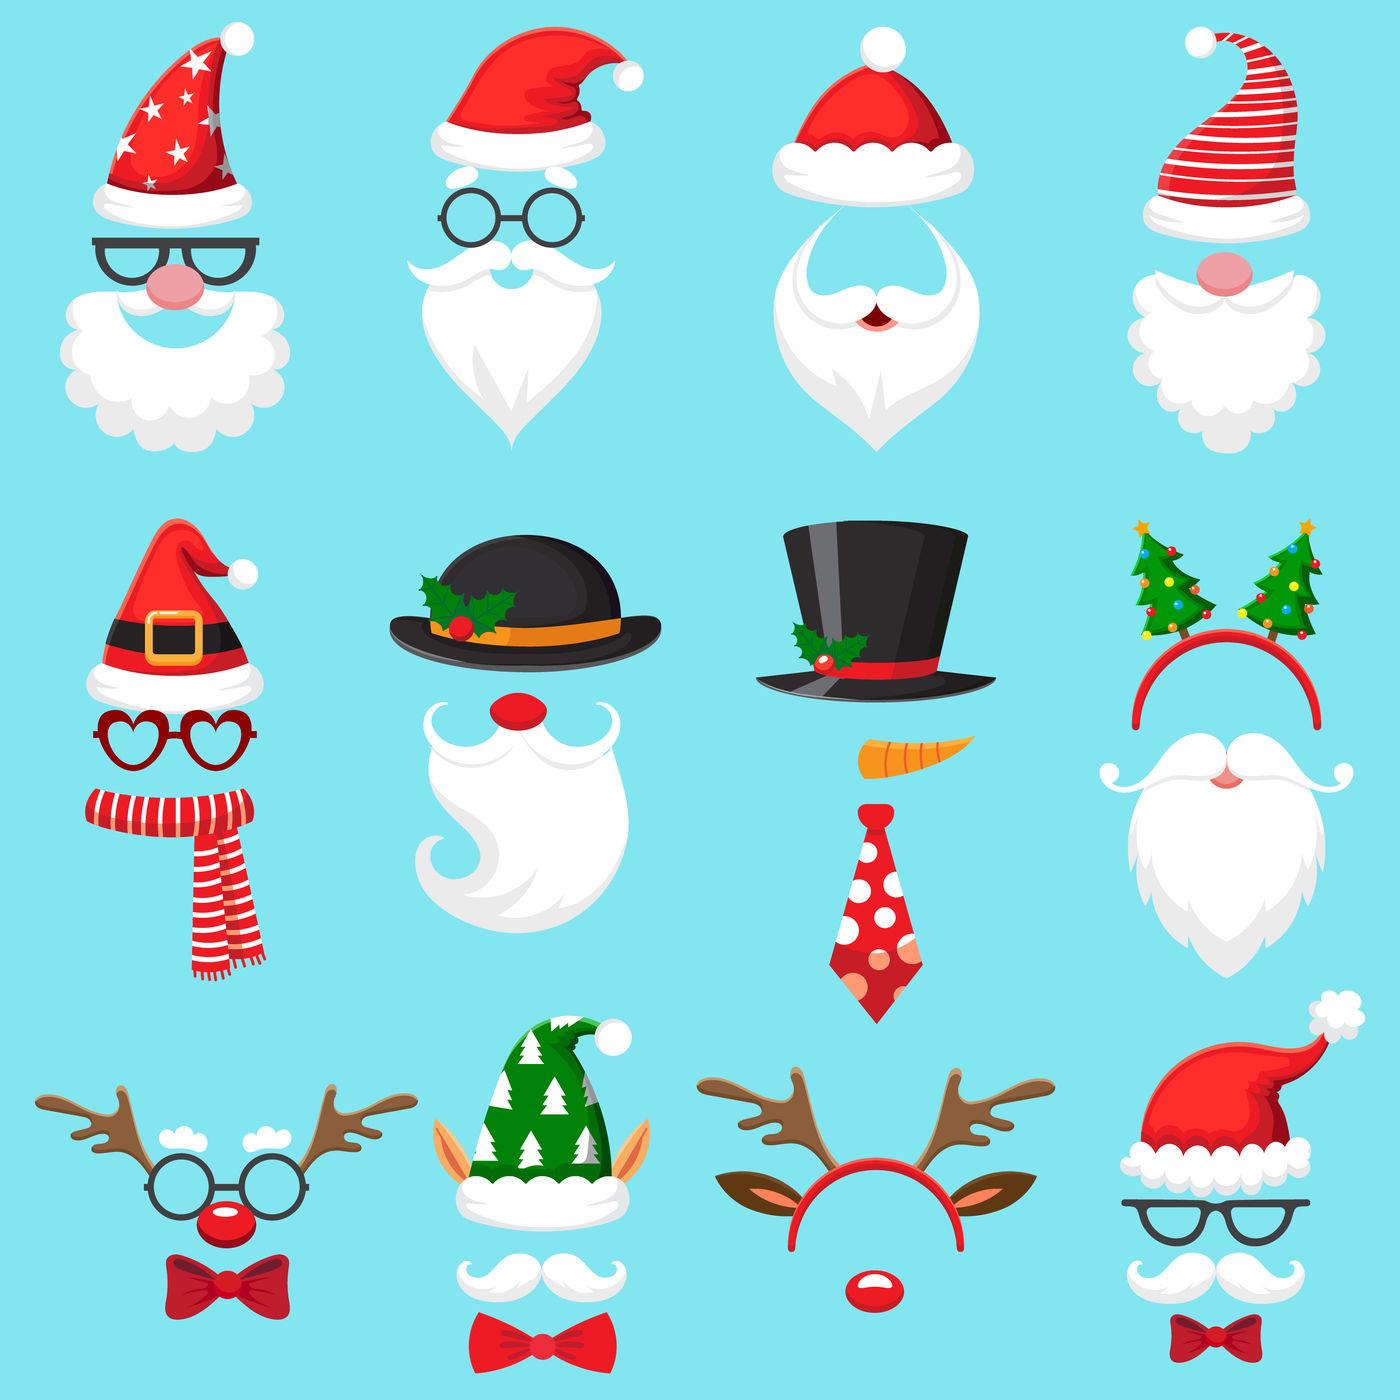 Christmas Cartoon Hats Xmas Santa Hat Elf Cap And Reindeer Photo